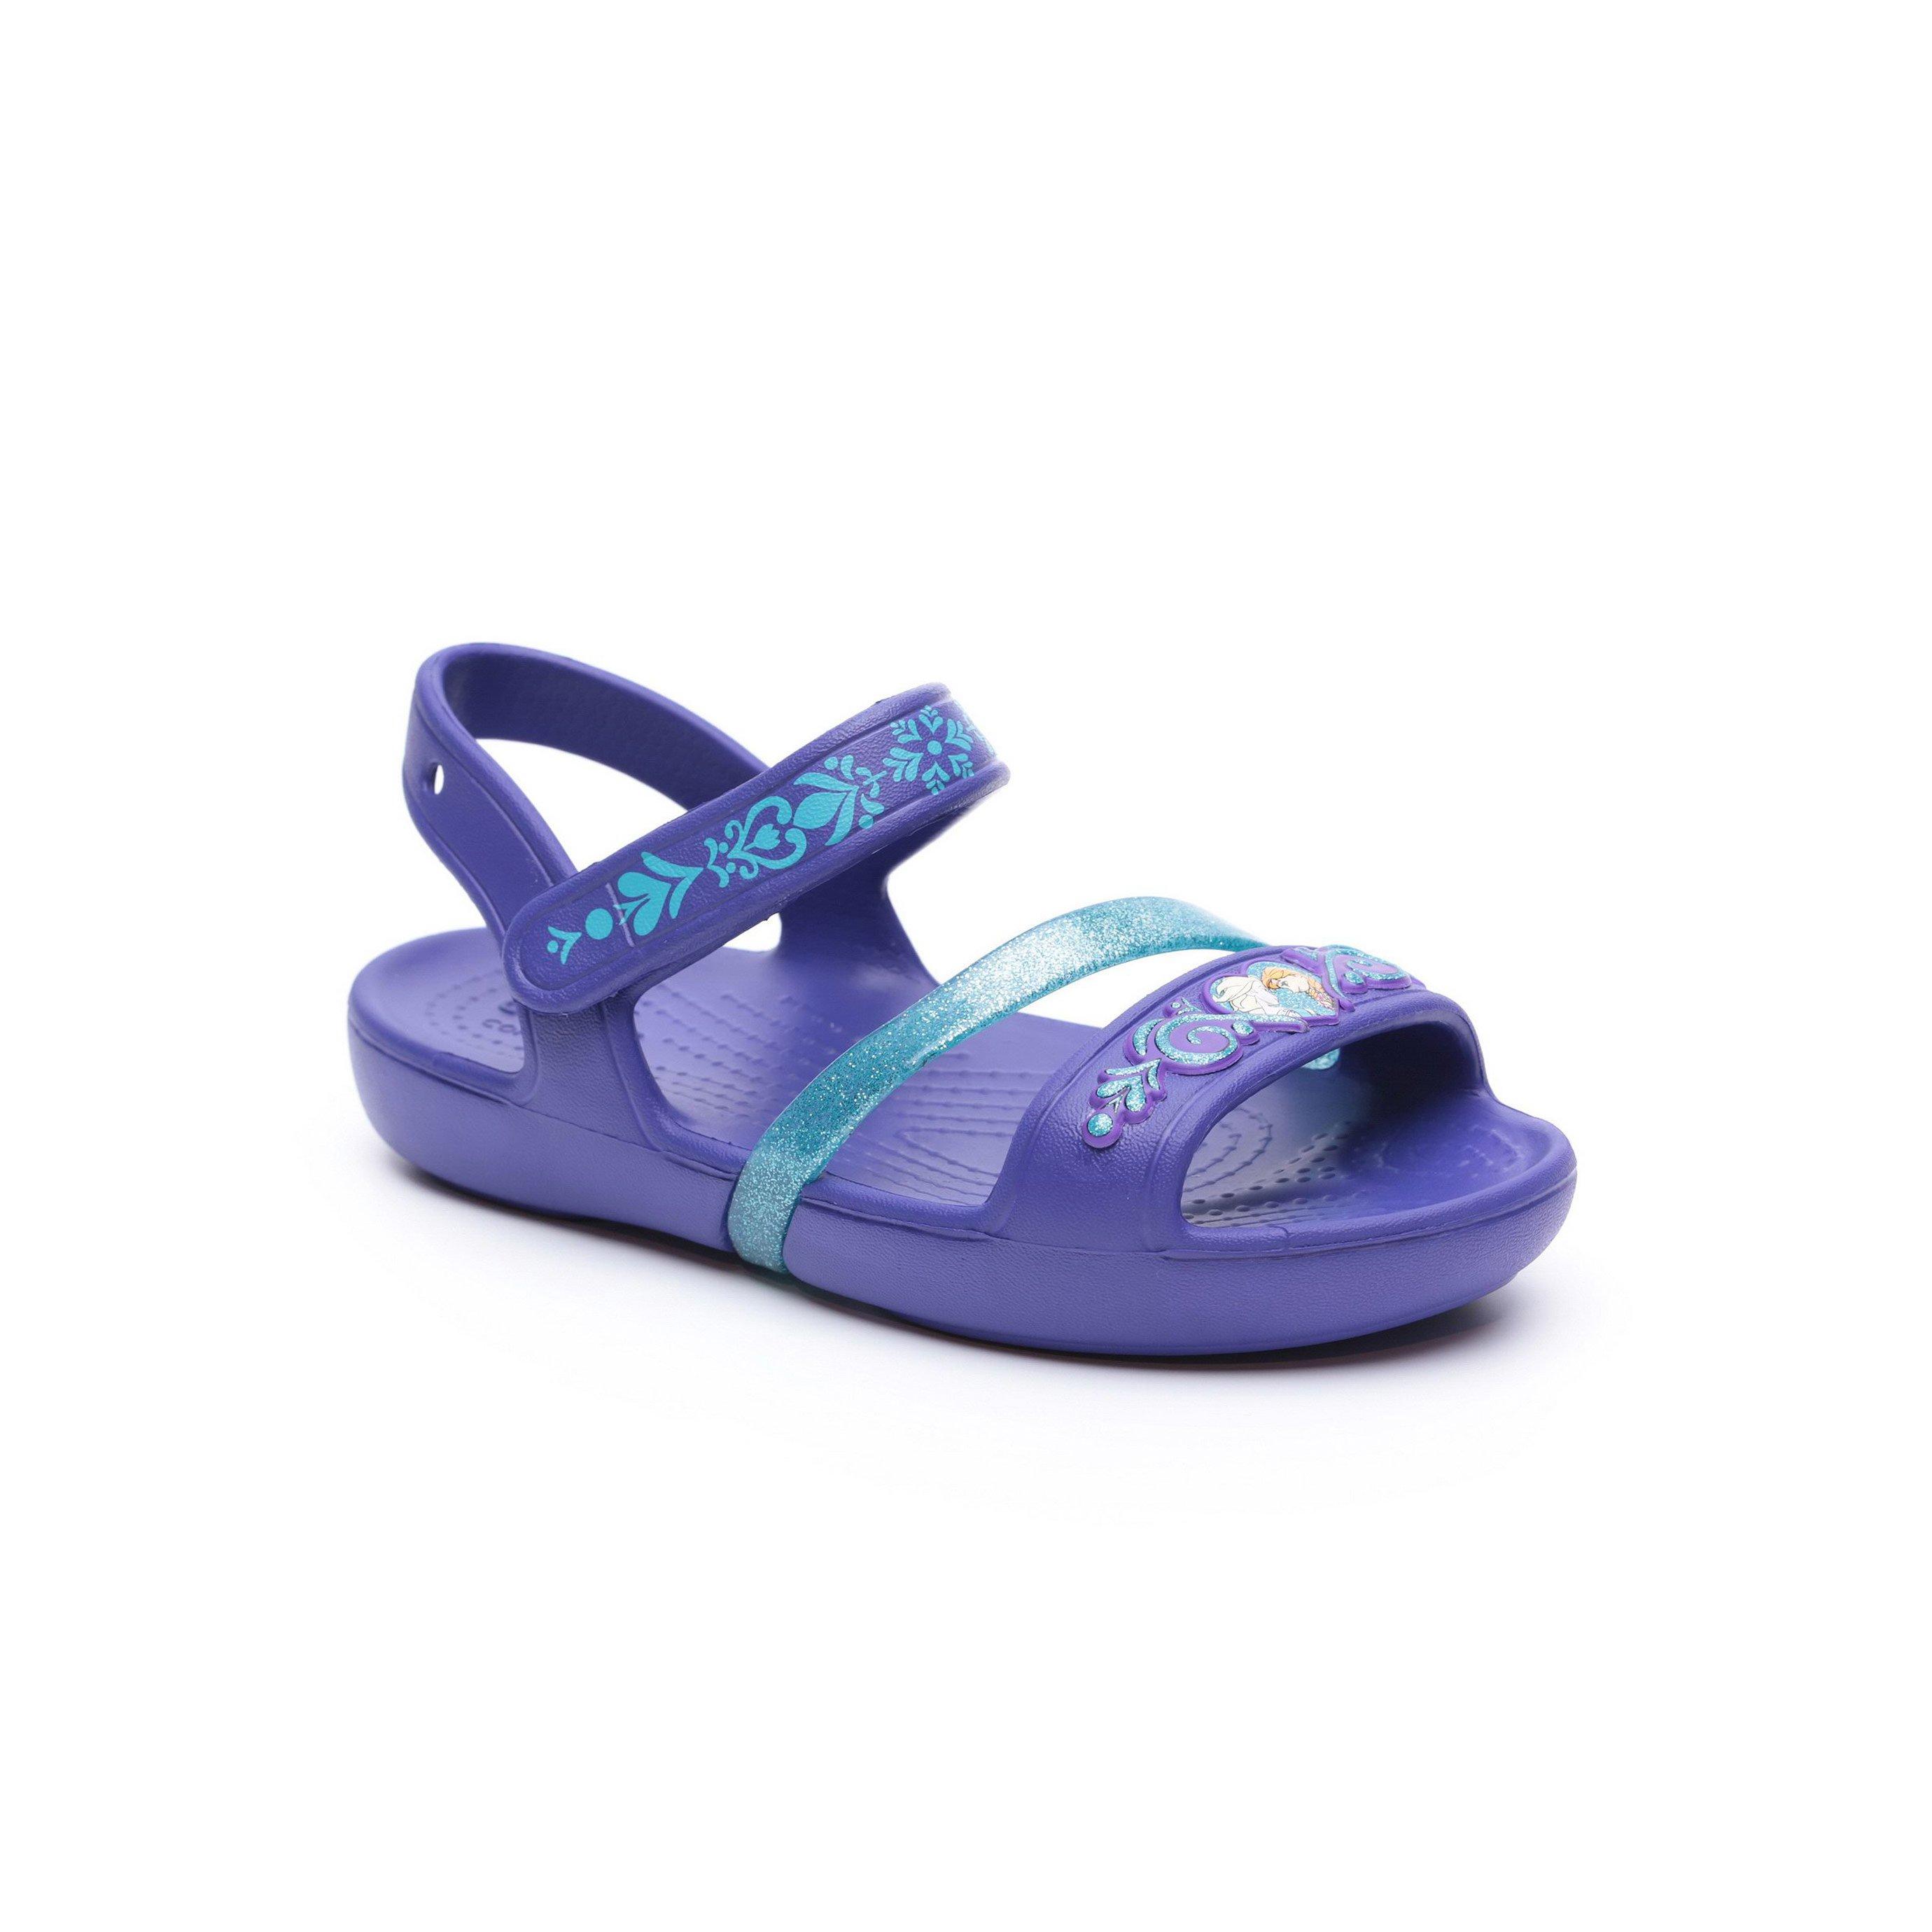 Crocs Lina Frozen Sandal - סנדל לילדות אנה ואלזה בצבע סגול